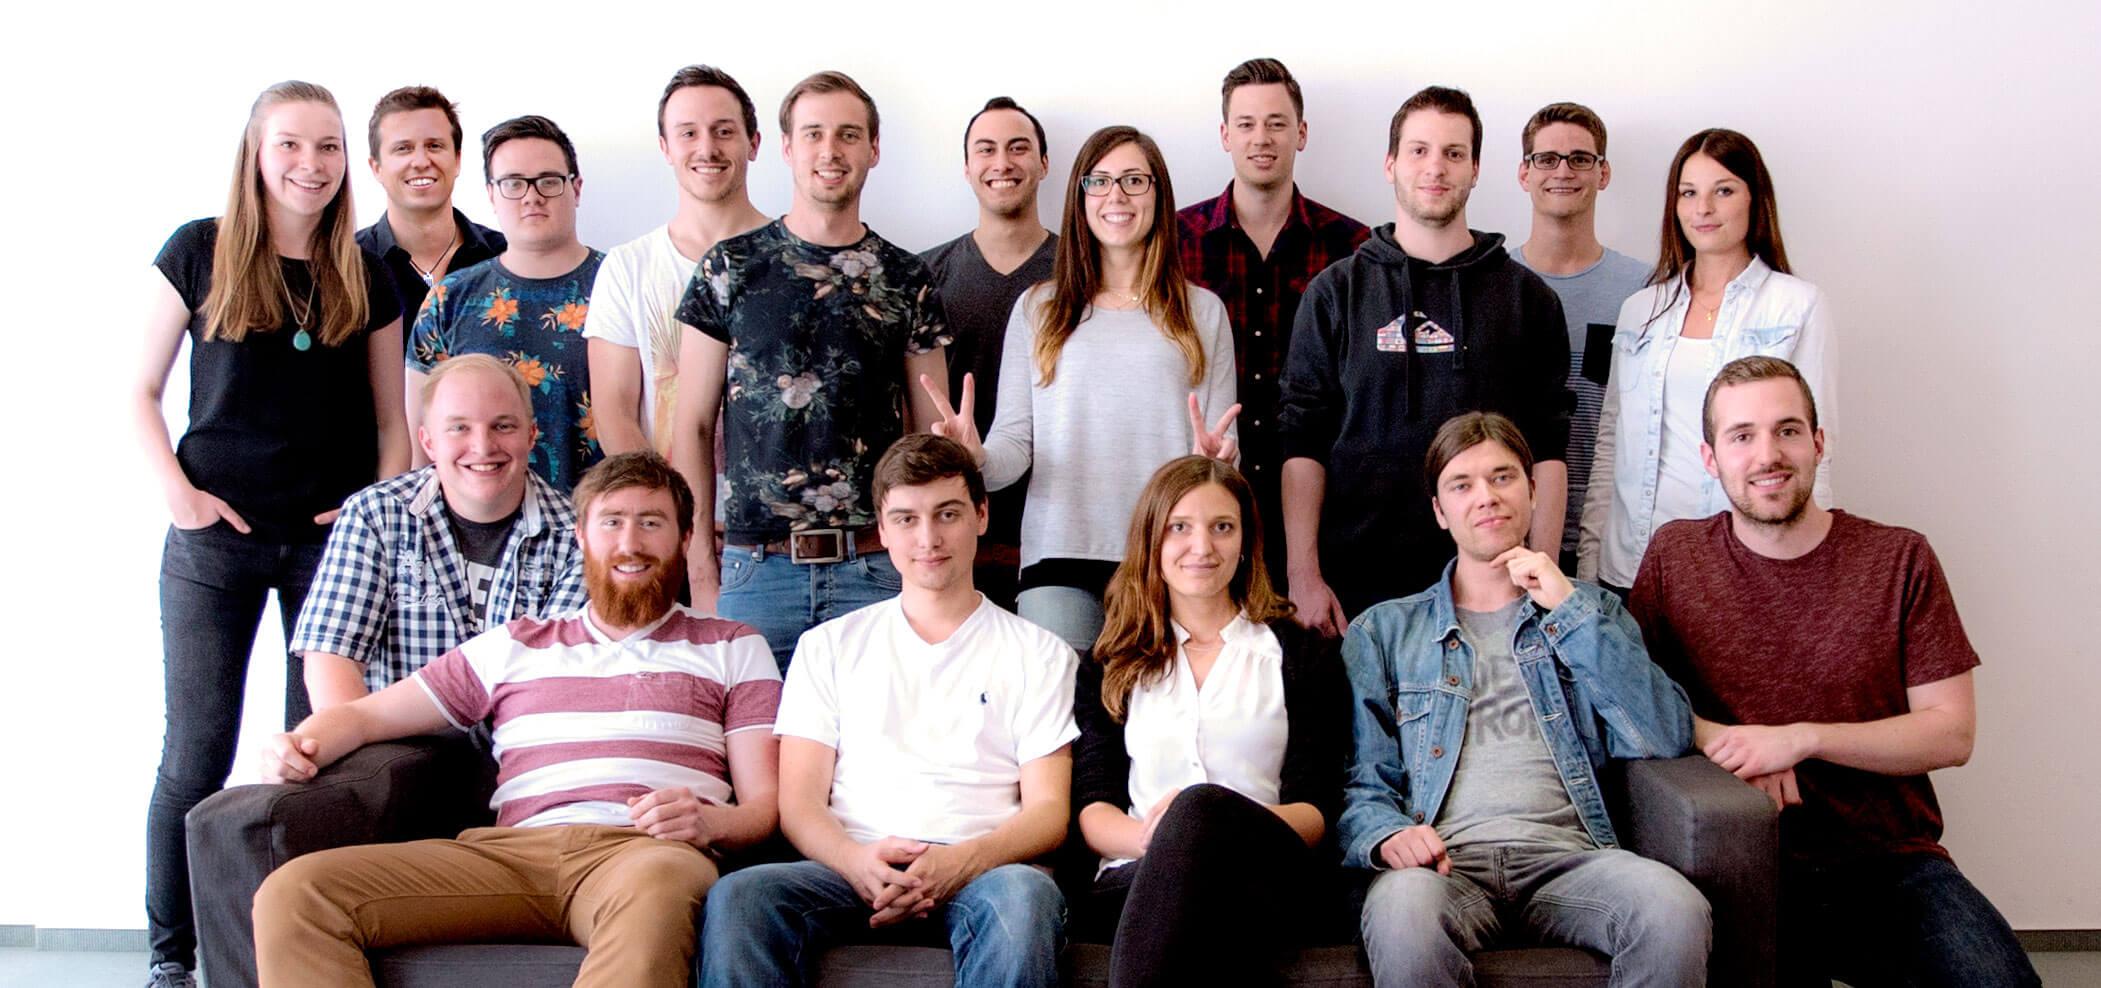 Das Team von SevDesk (Foto SevDesk)